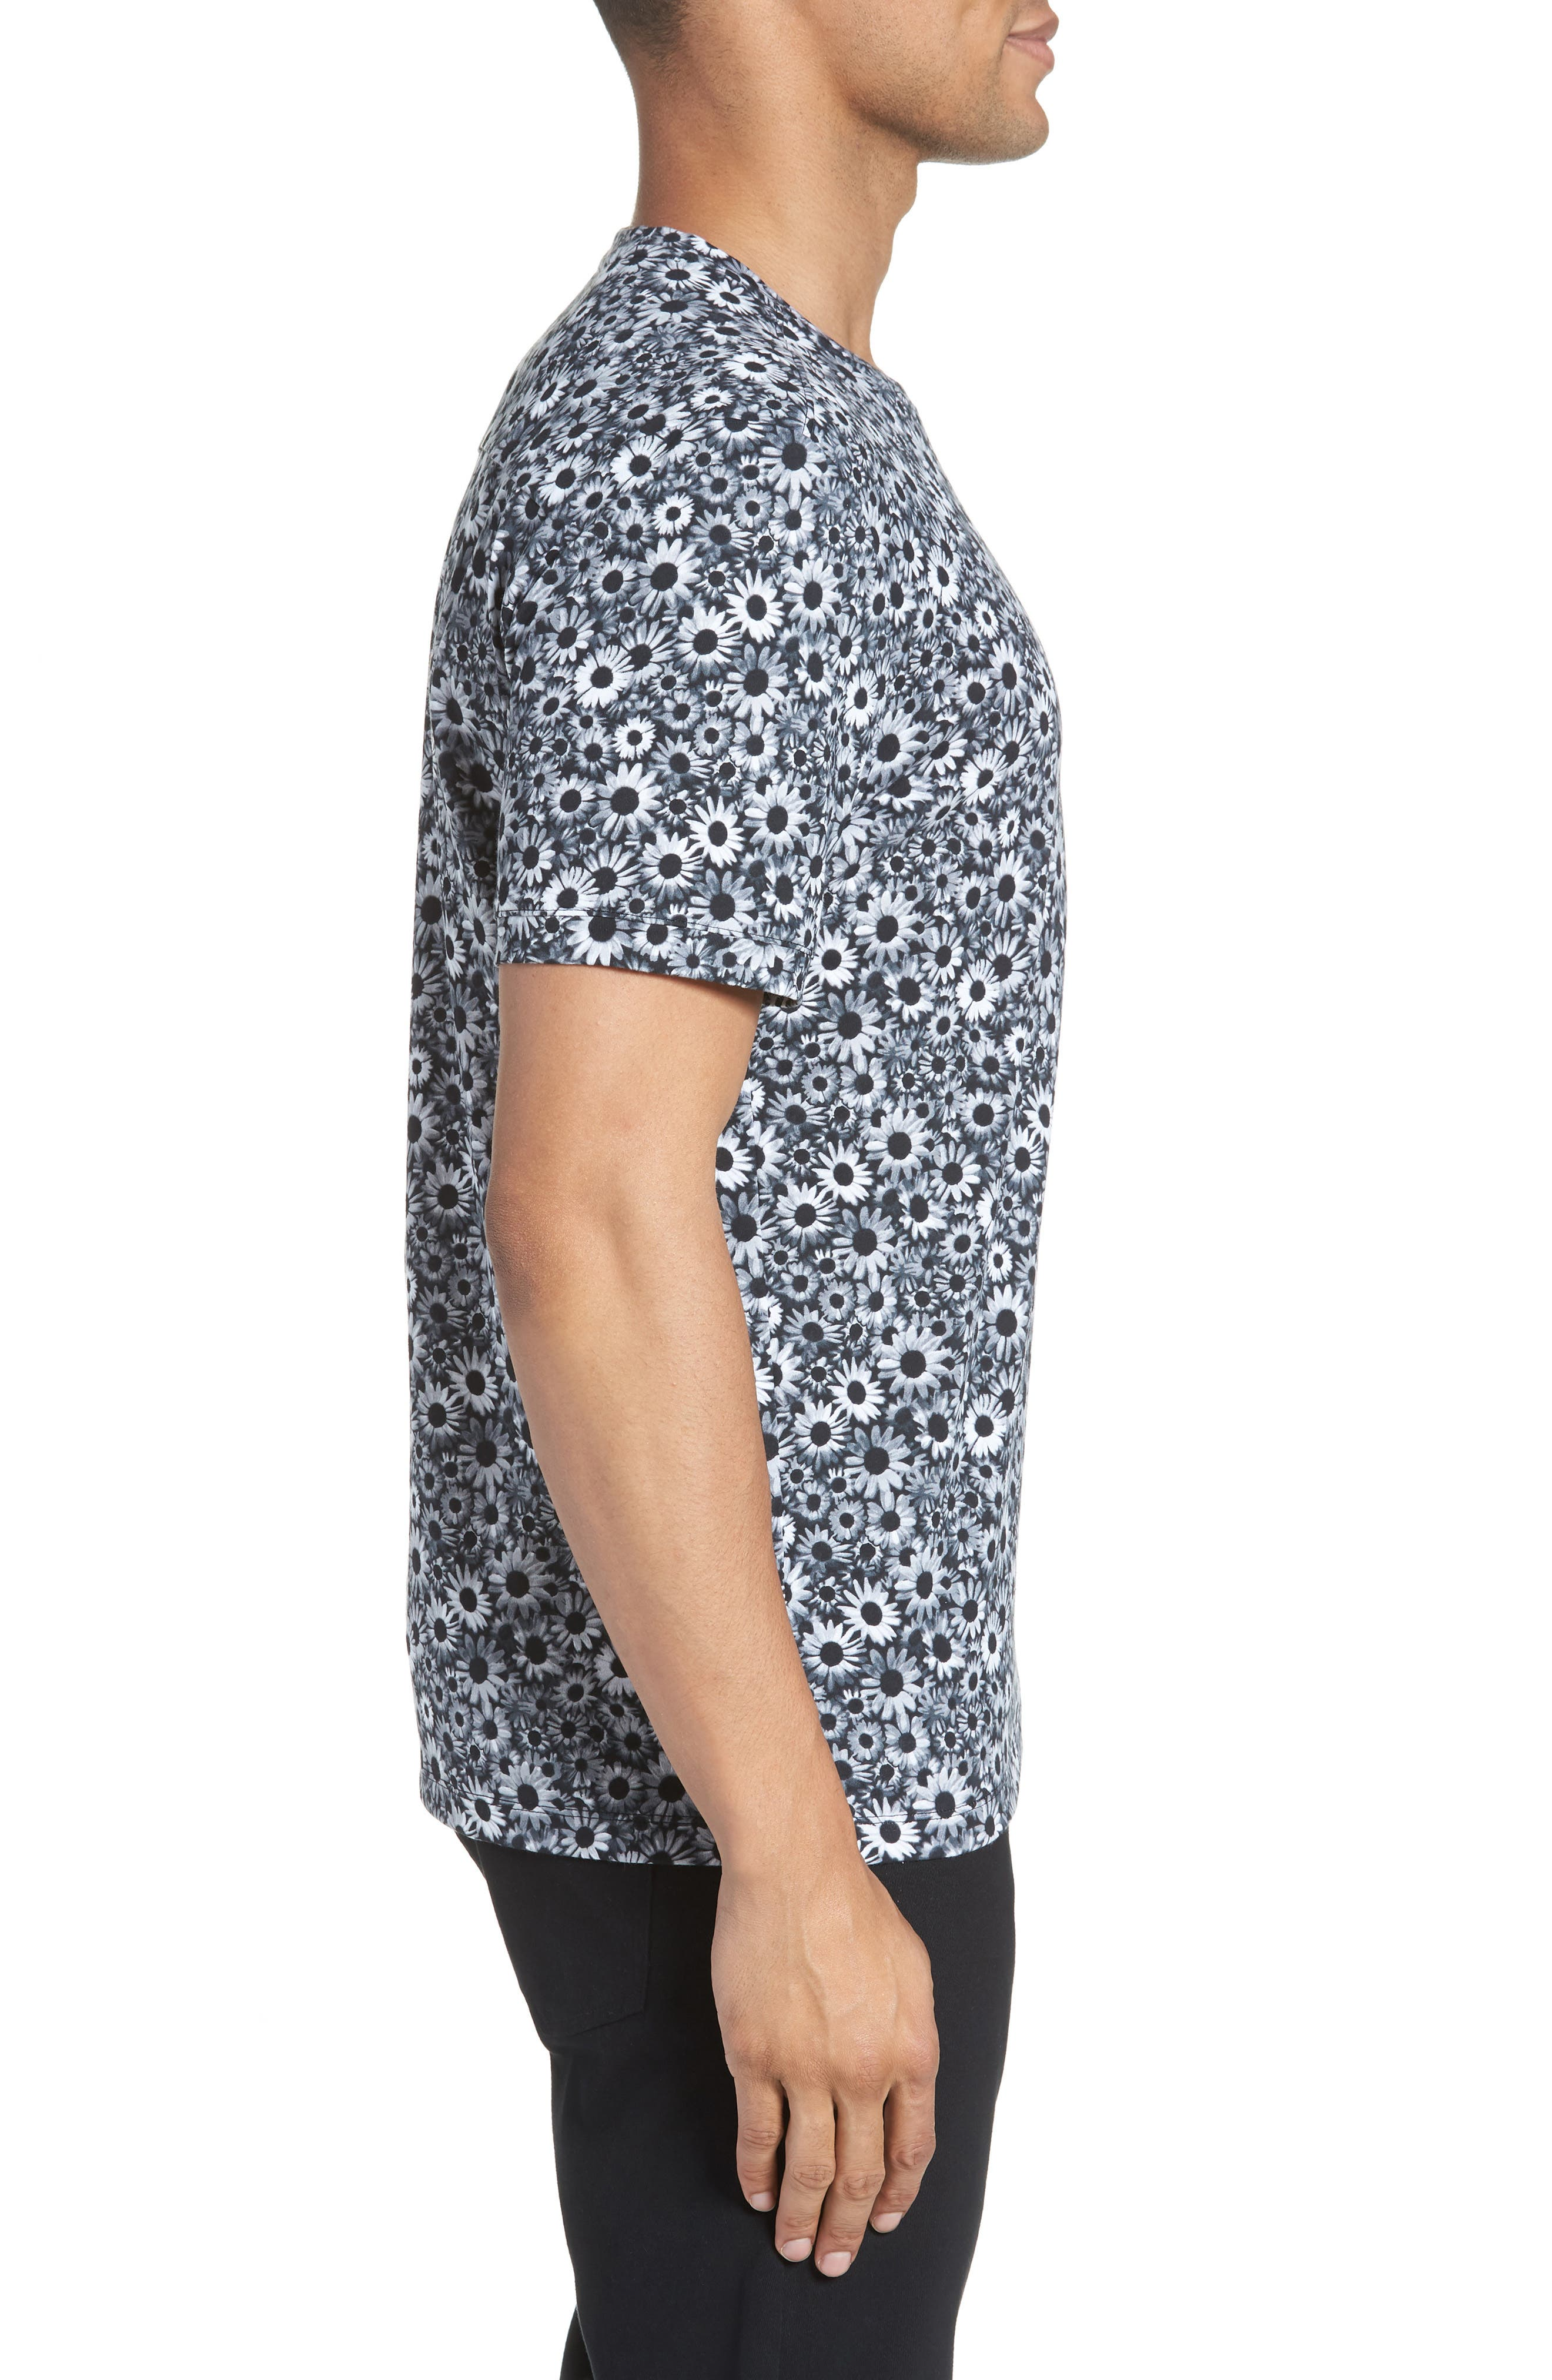 Print T-Shirt,                             Alternate thumbnail 3, color,                             BLACK WHITE DAISY FLORAL